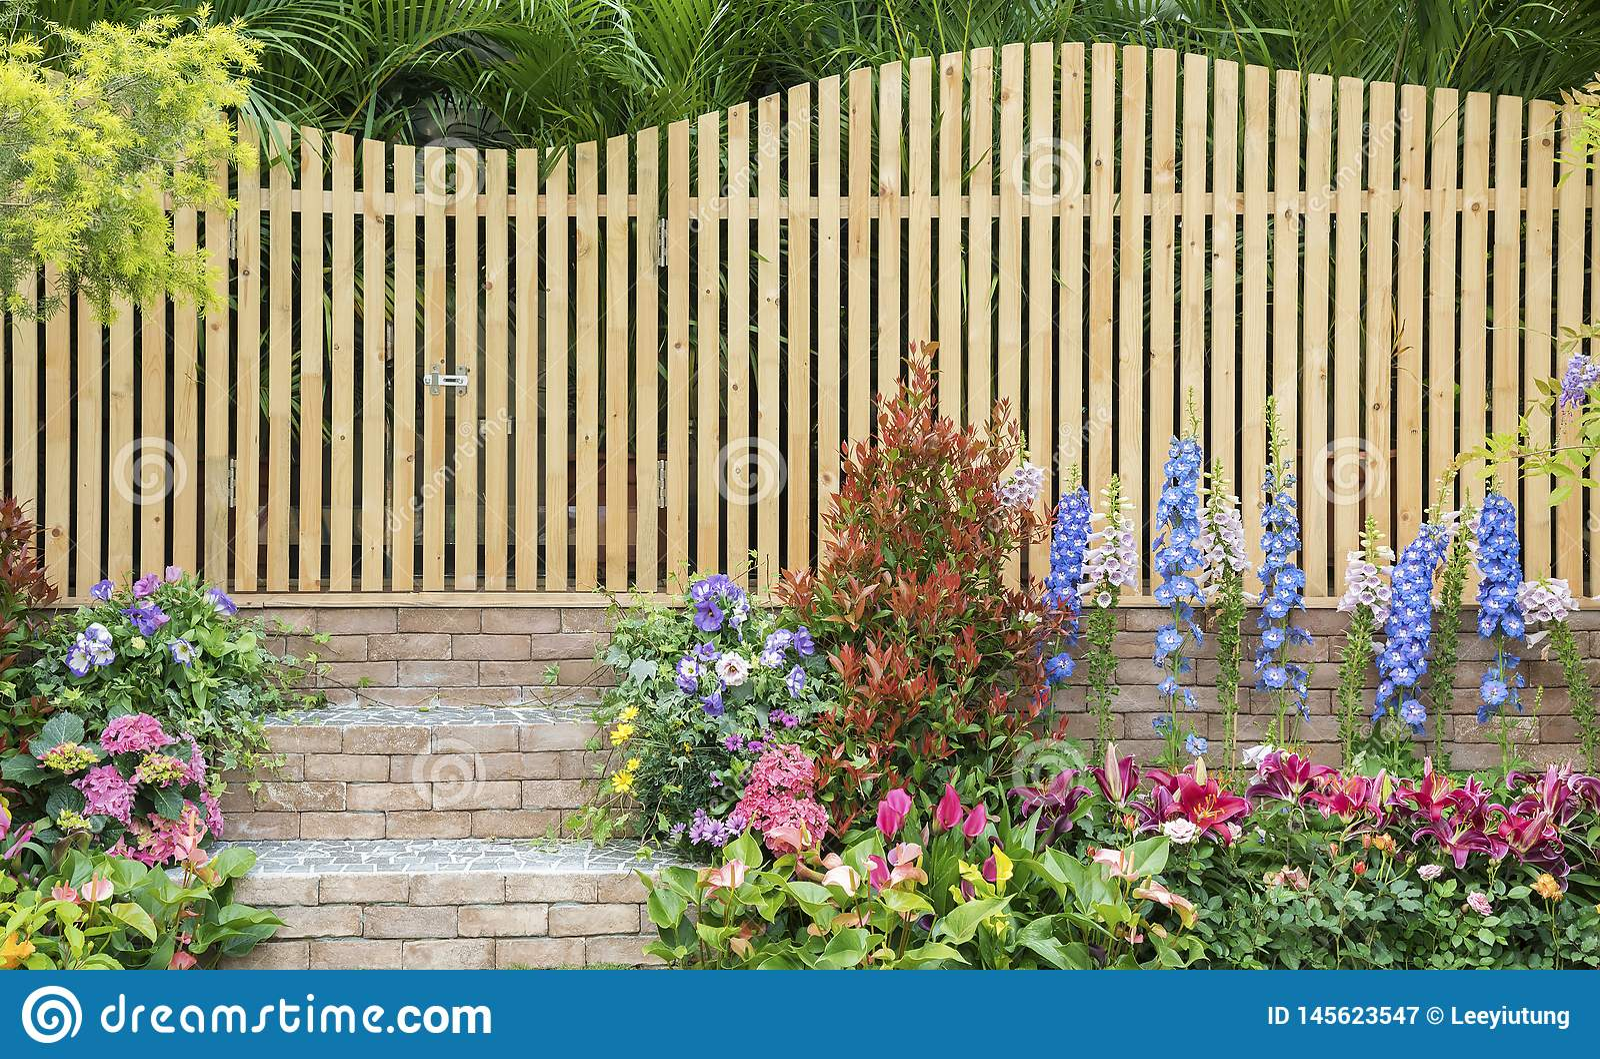 Wooden Fence Of Backyrad Flower Garden Stock Image Image Of Bush